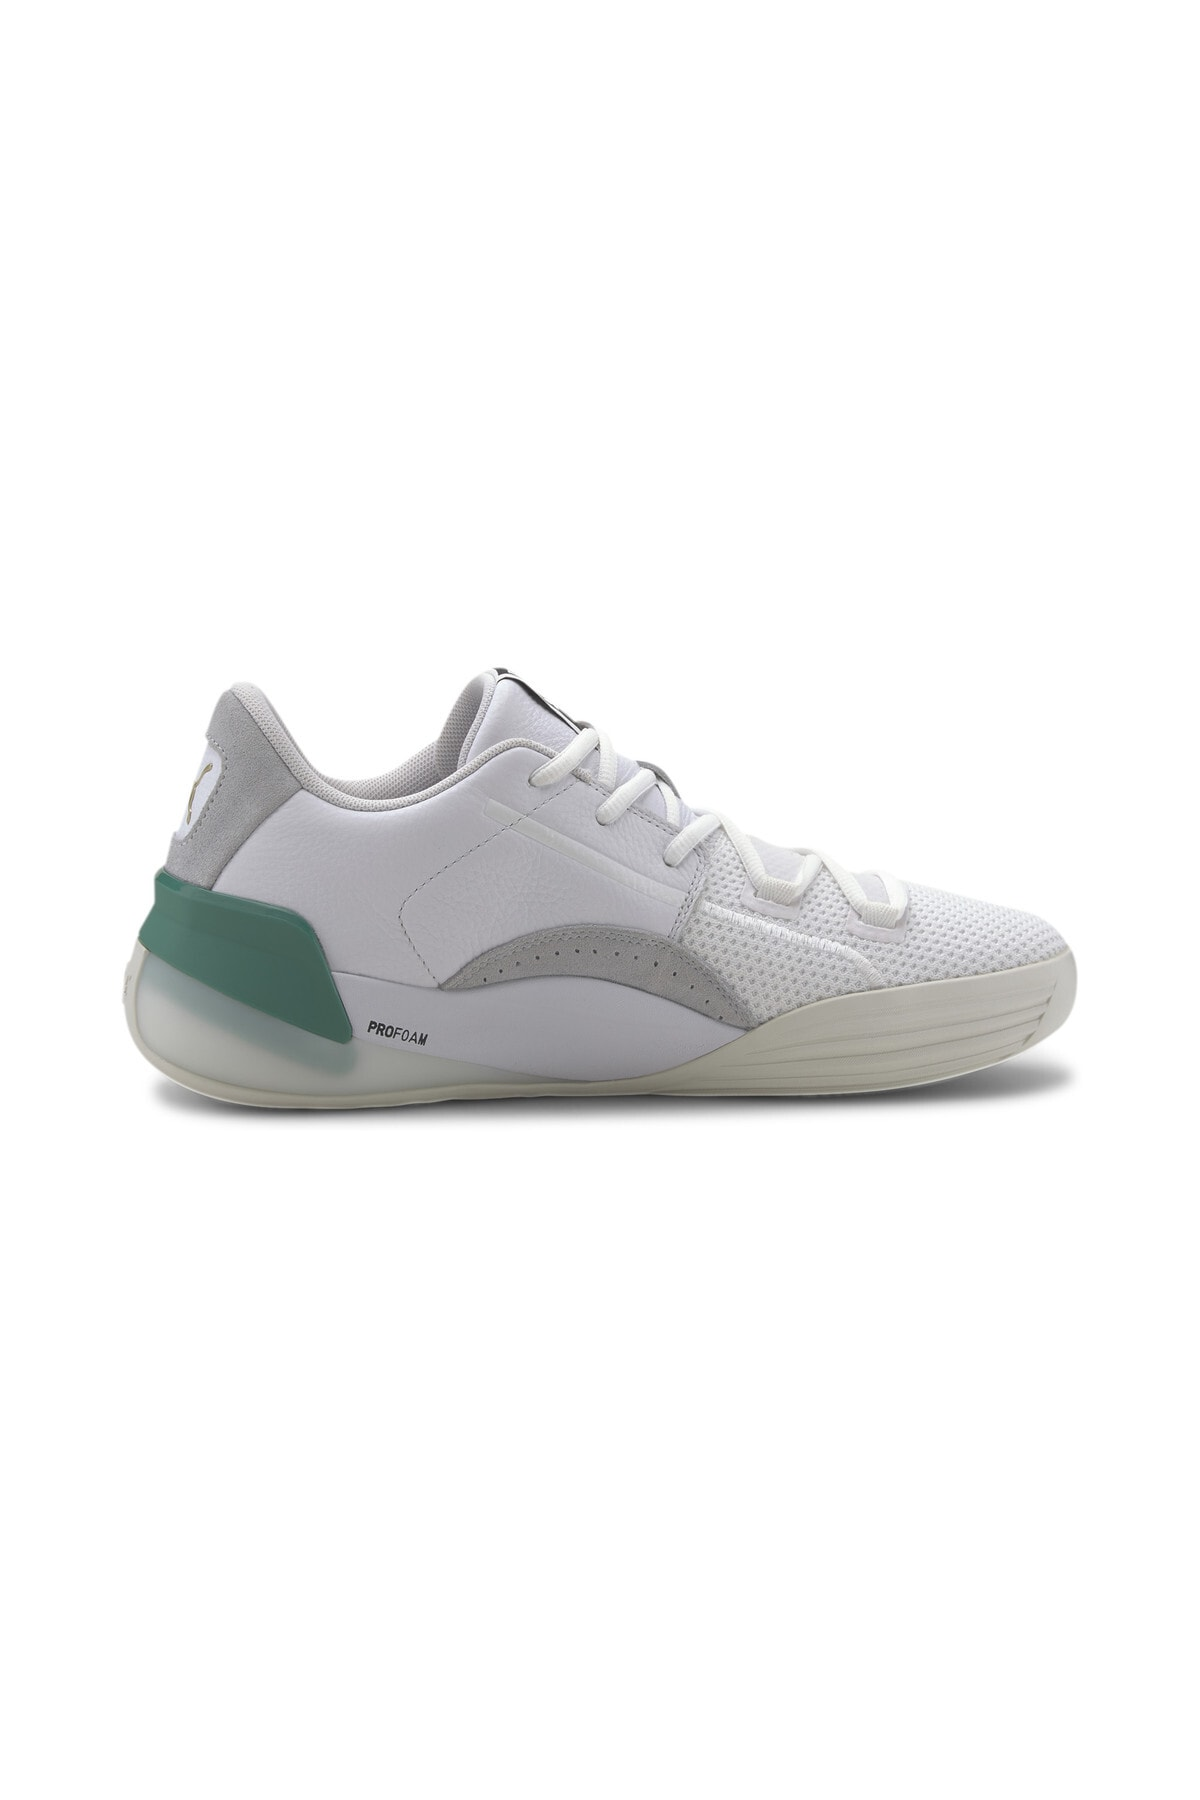 Puma Clyde Hardwood Basketbol Ayakkabısı 4